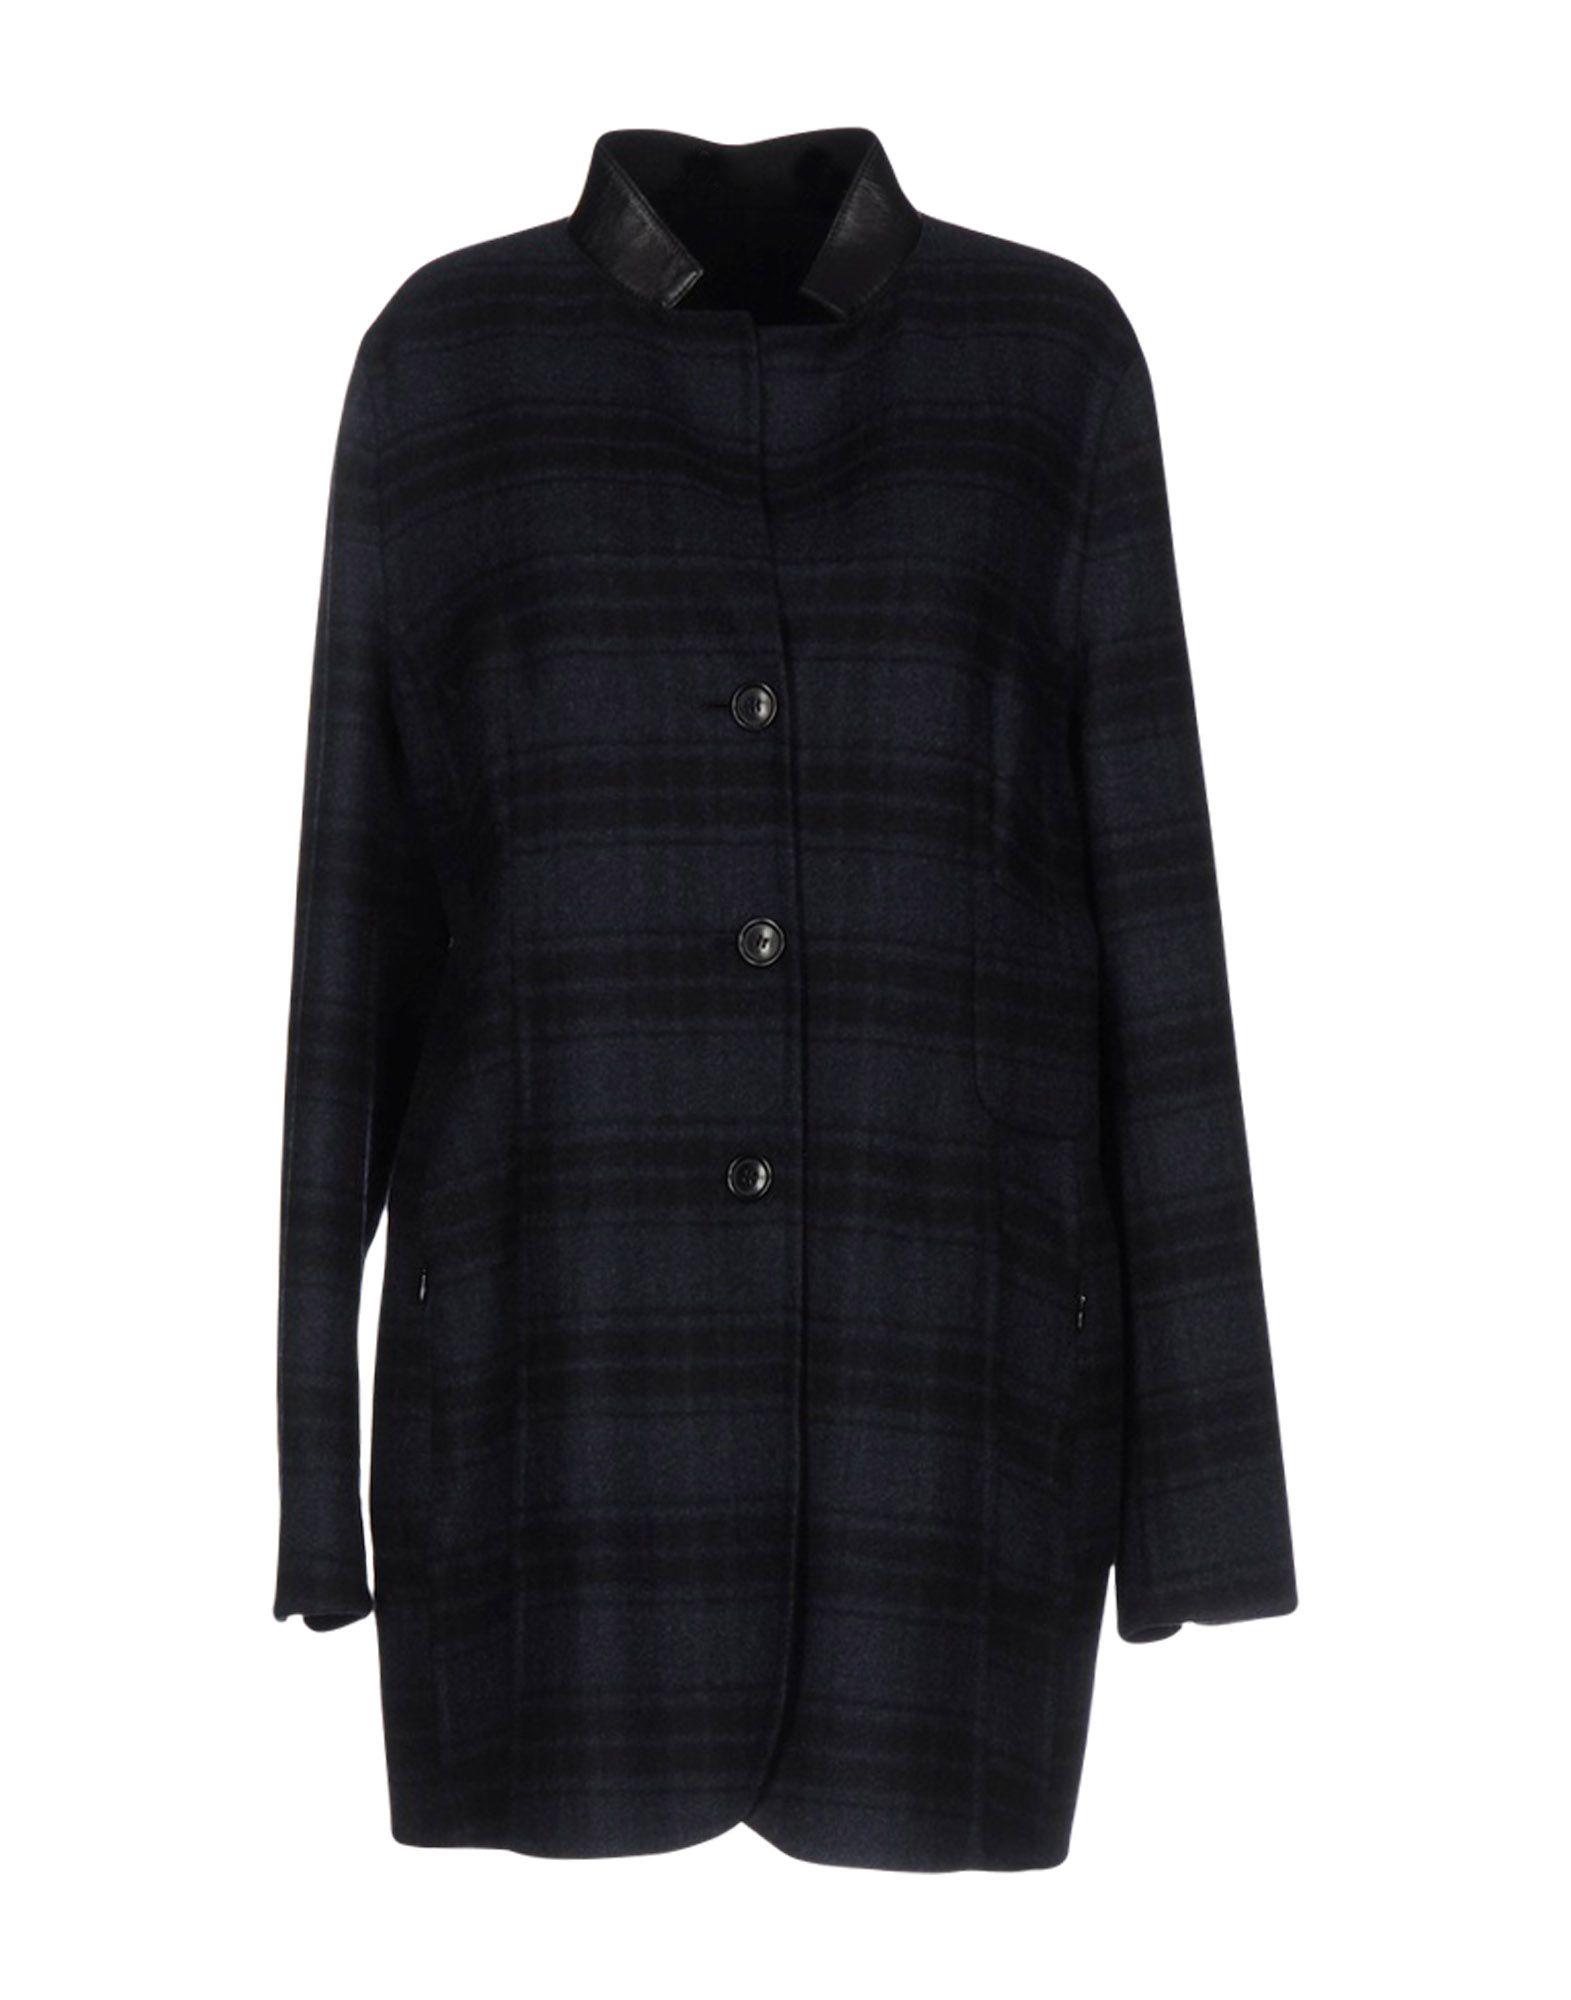 AKRIS Damen Lange Jacke Farbe Dunkelblau Größe 7 - broschei